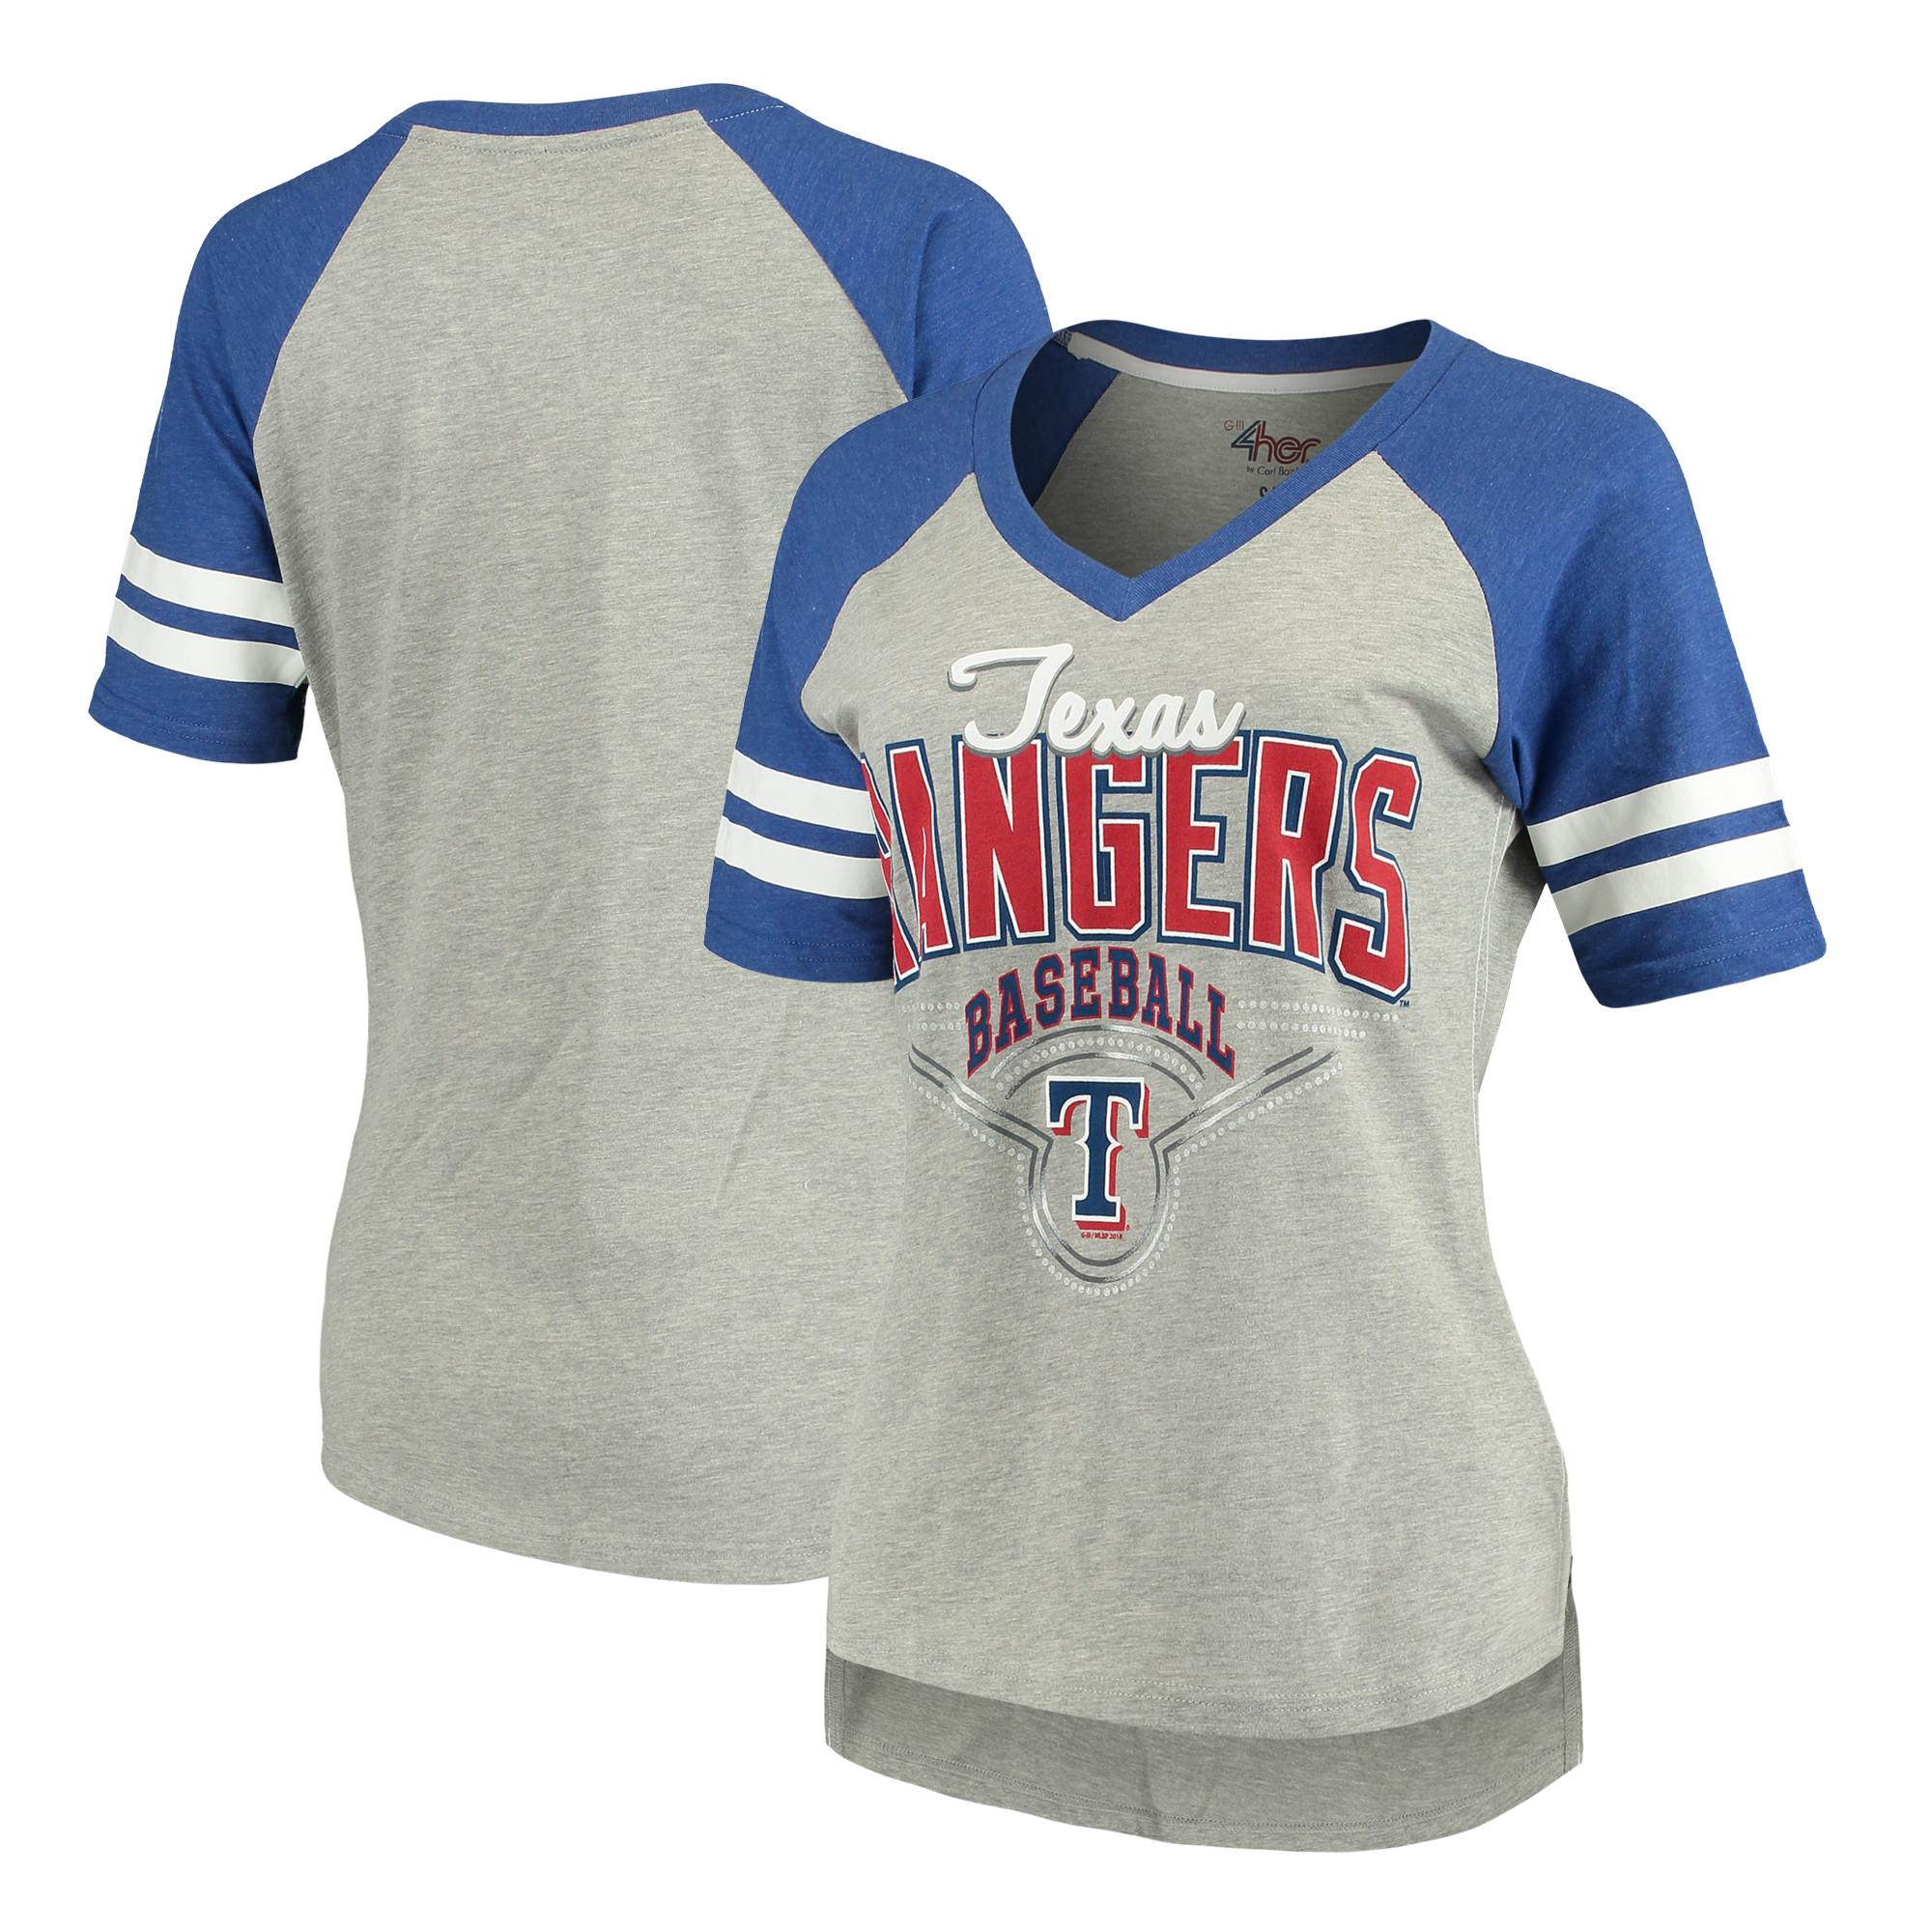 Texas Rangers G-III 4Her by Carl Banks Women's Goal Line T-Shirt - Heathered Gray/Royal